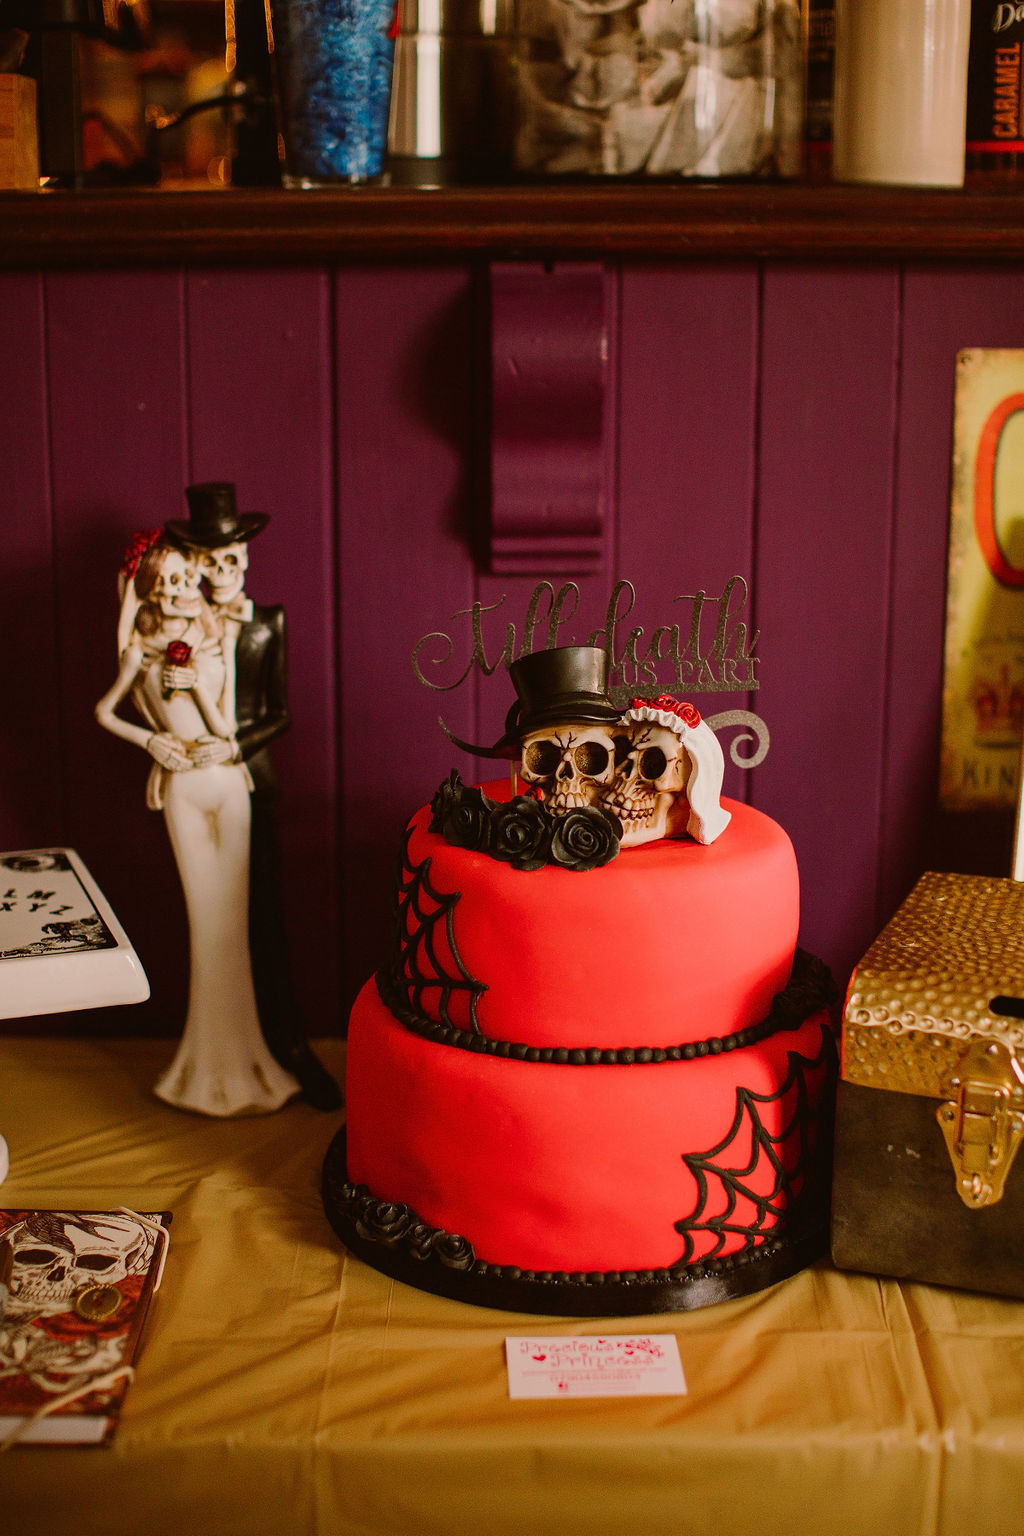 red and black gothic wedding cake - red wedding cake with skulls and cobwebs - alternative wedding cake